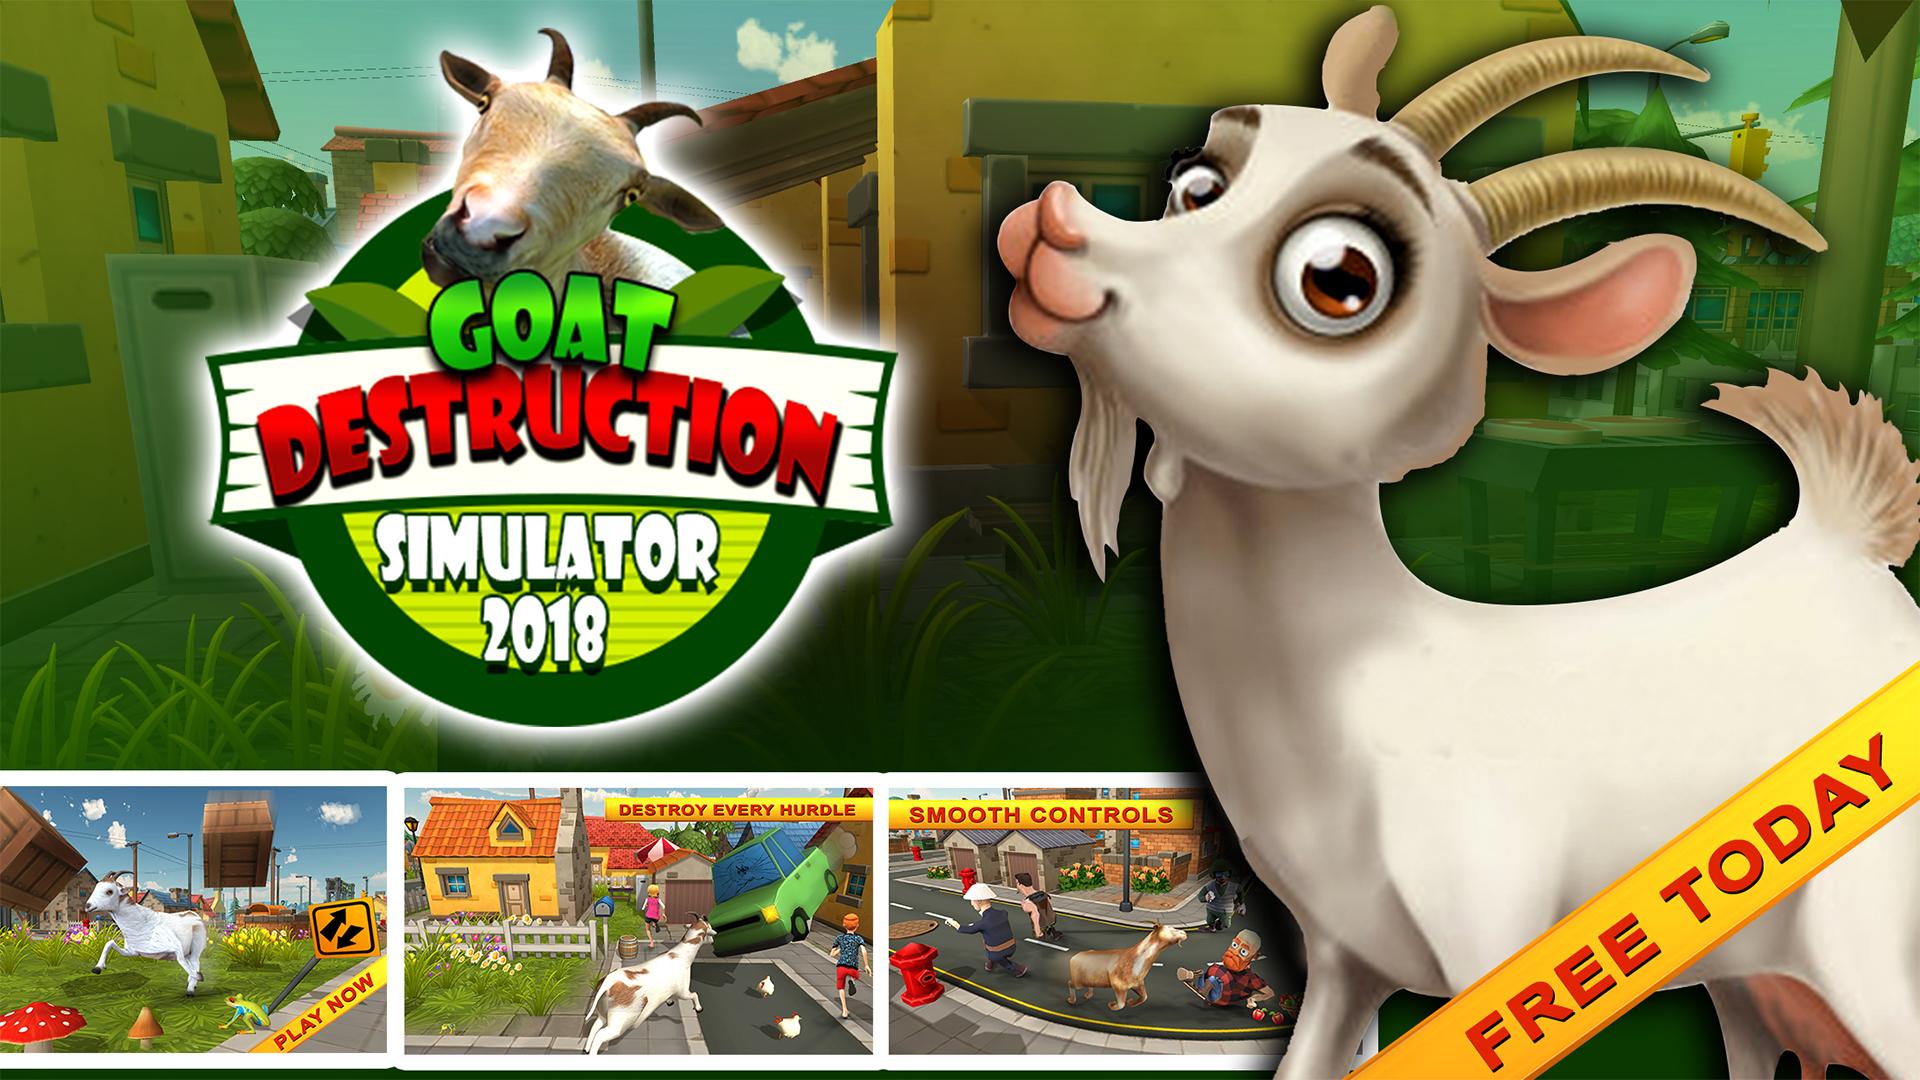 Destruction simulator codes 2018   Roblox Vehicle Simulator